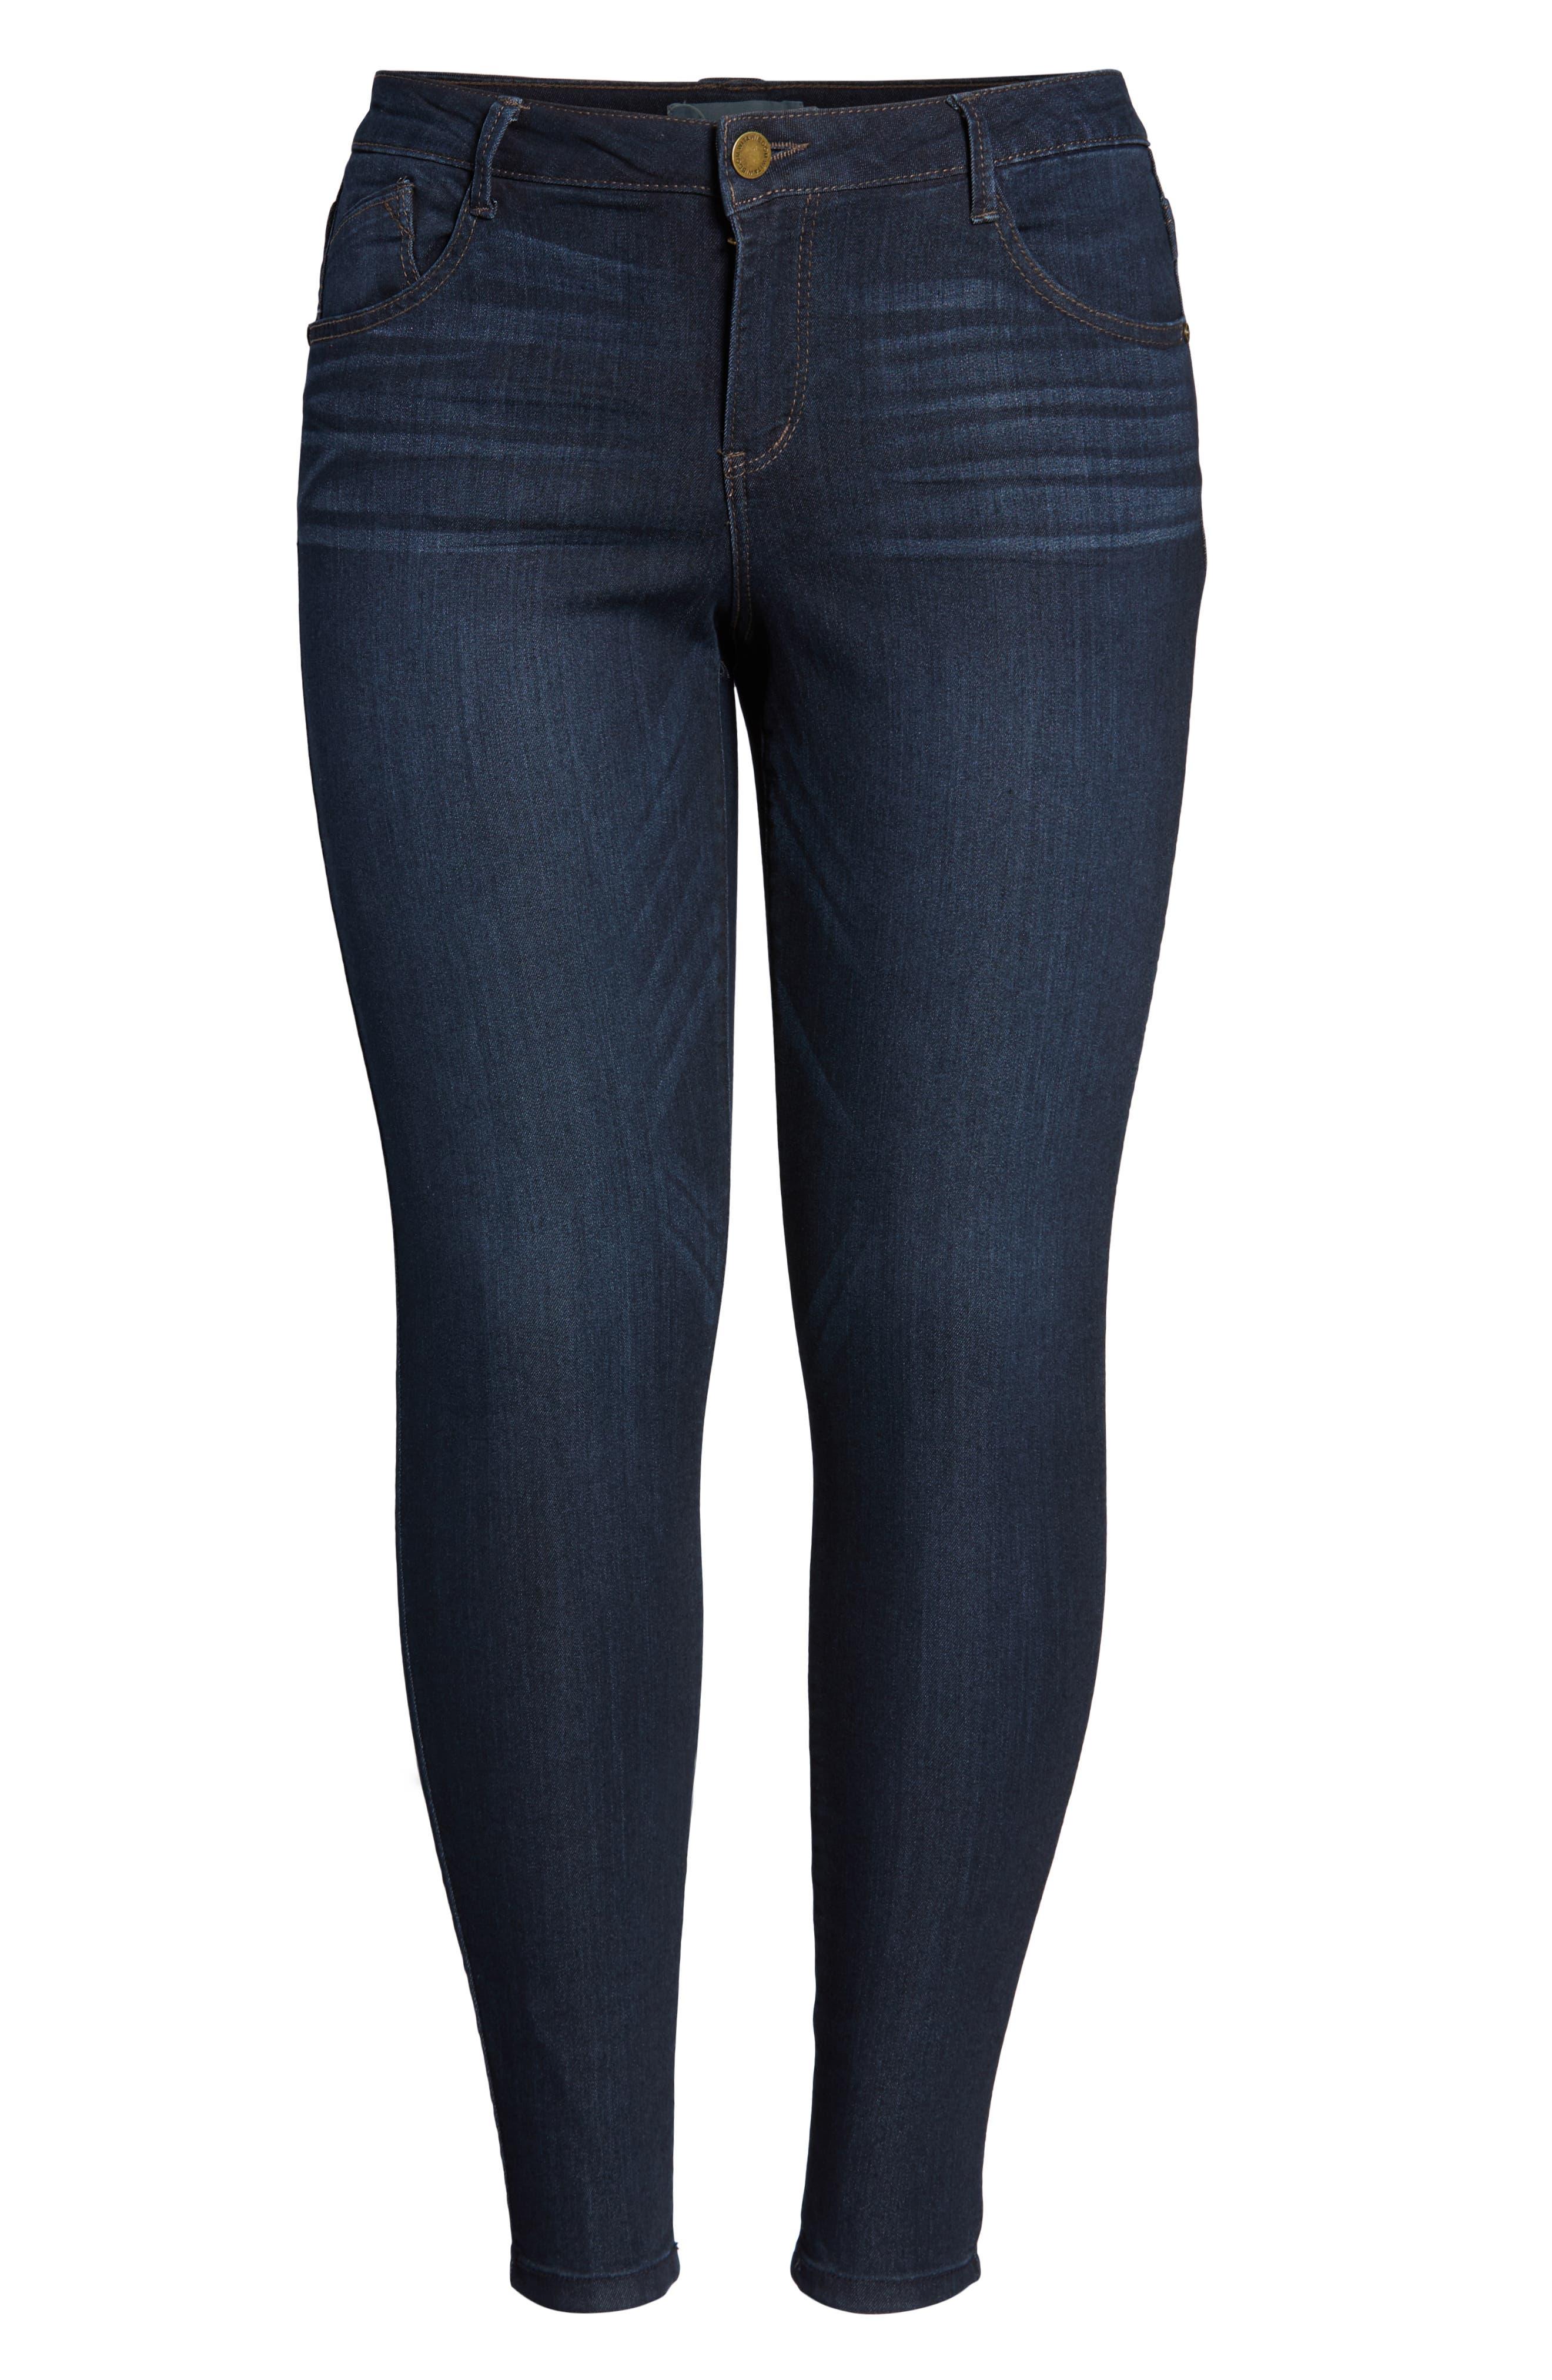 WIT & WISDOM, 'Super Smooth' Stretch Skinny Jeans, Alternate thumbnail 2, color, DARK NAVY